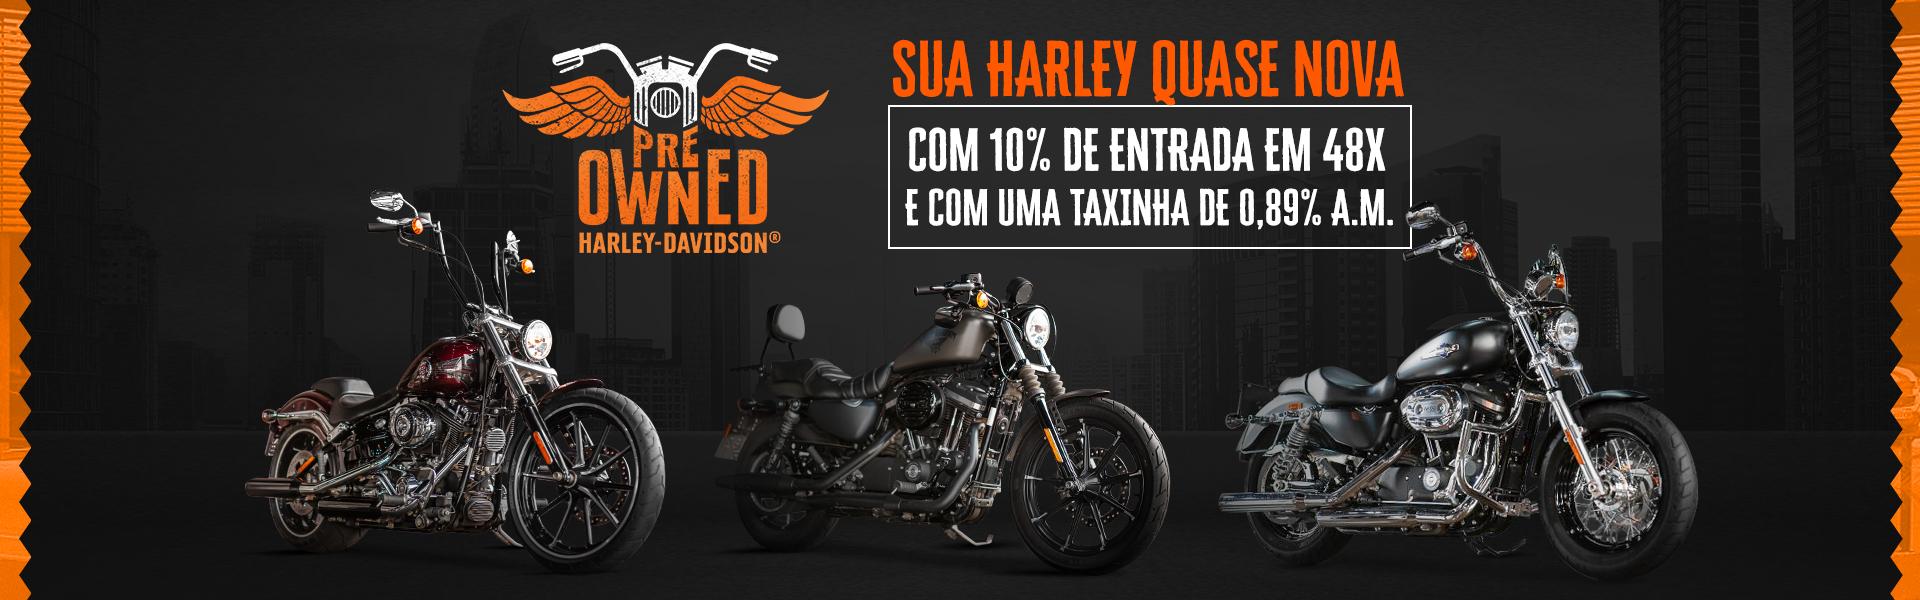 Ofertas - Brasília Harley-Davidson®